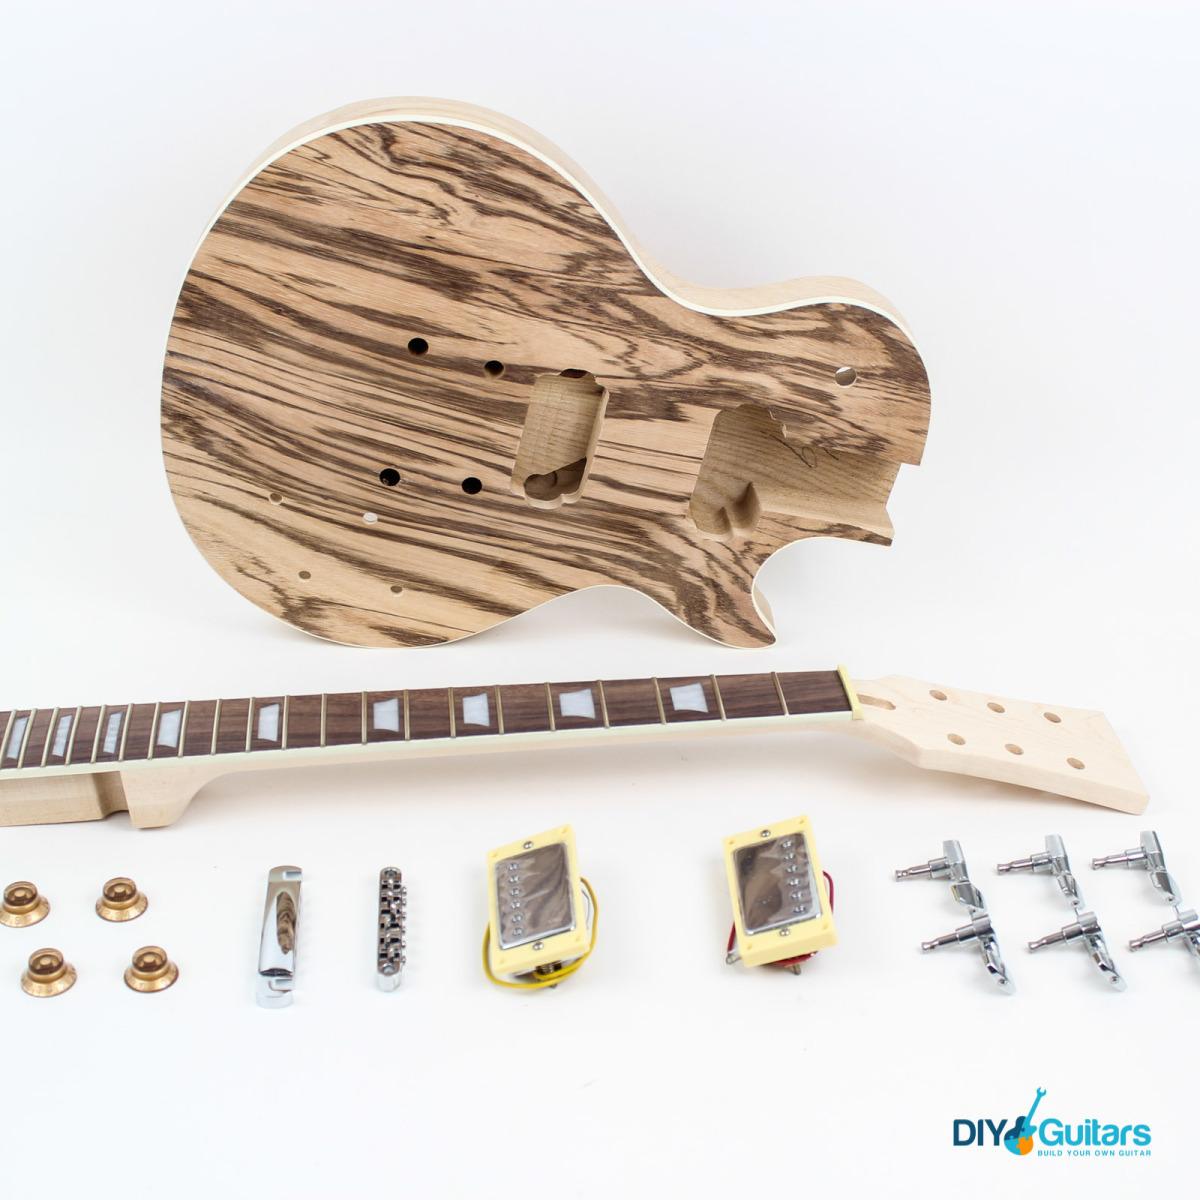 Les paul style guitar kit ash diy guitars main components solutioingenieria Image collections